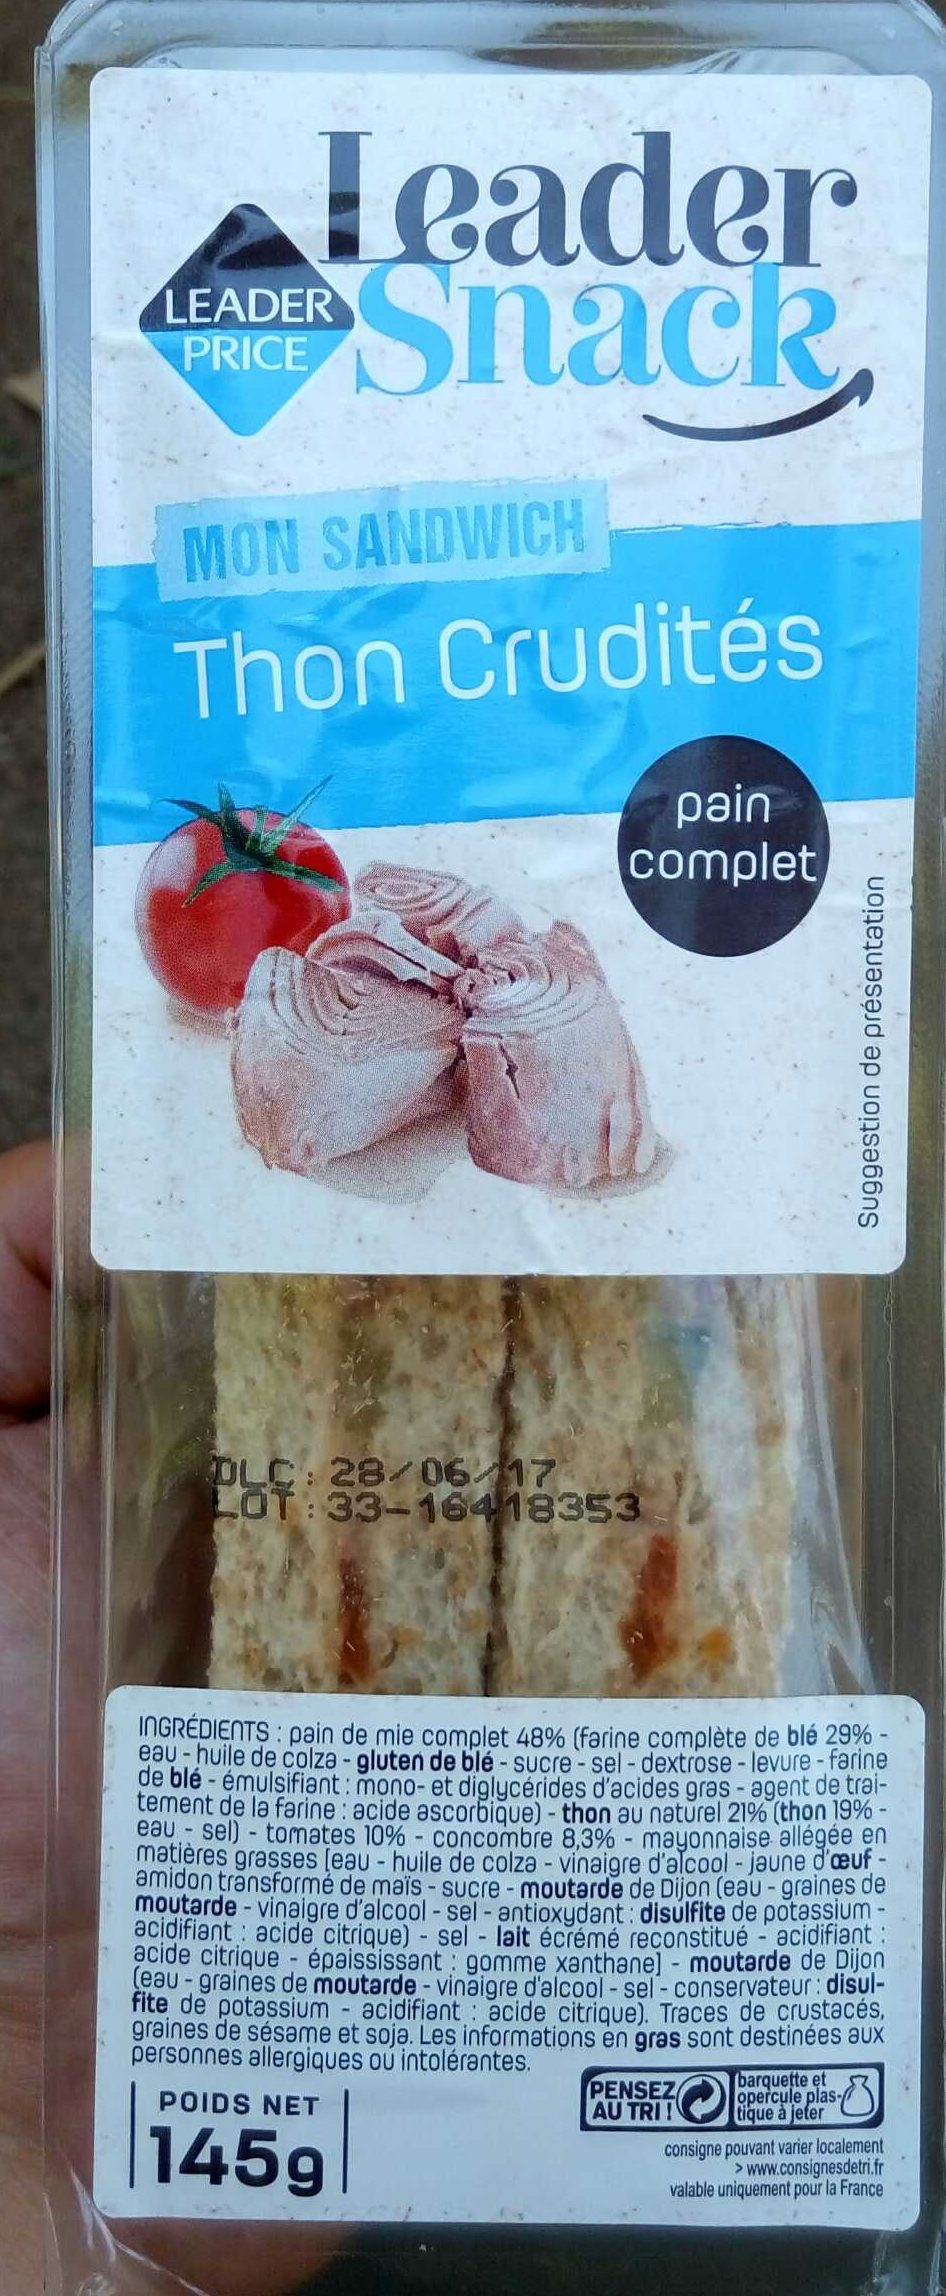 Sandwich thon crudités - Produit - fr